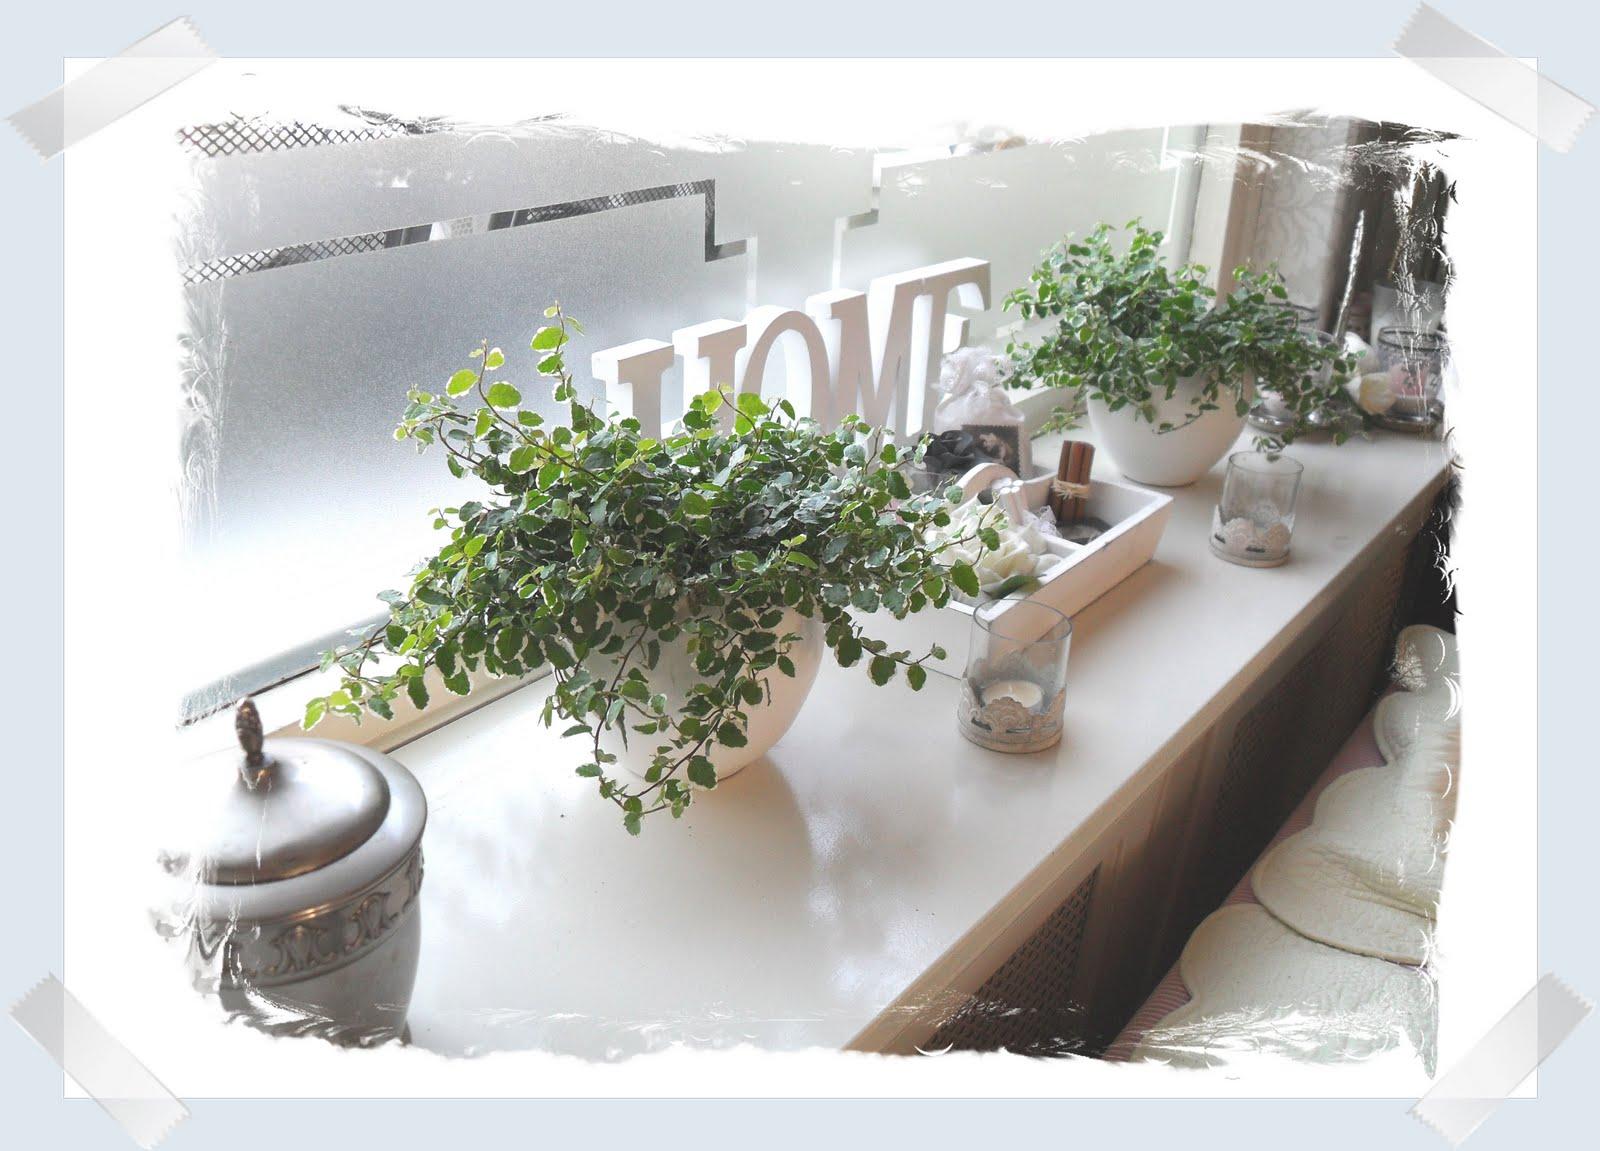 Decoratie Planten Woonkamer : Decoratie vensterbank woonkamer rh belbin